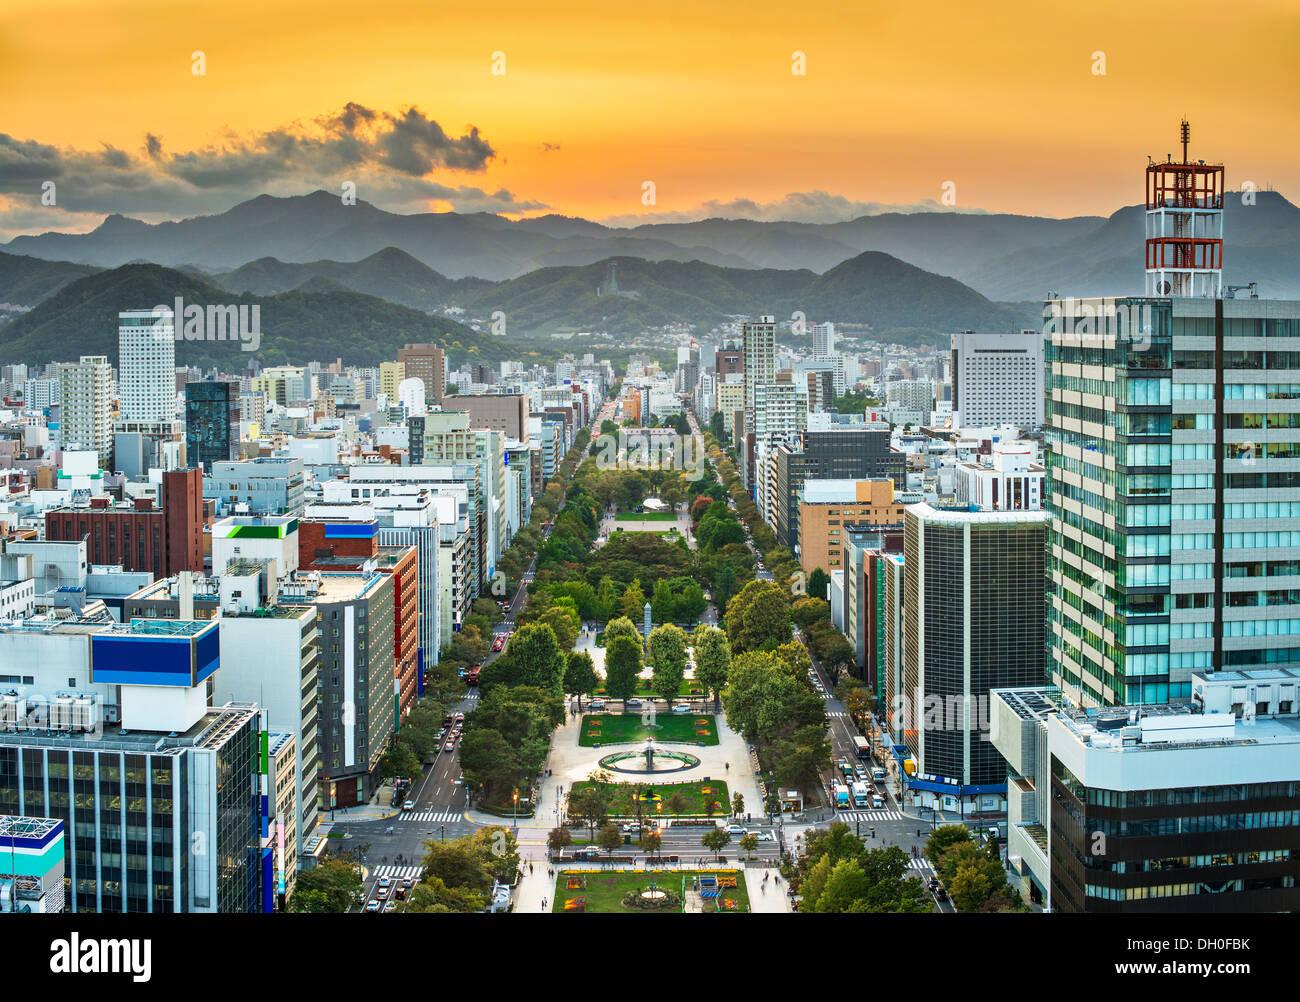 Cityscape of Sapporo, Japan at odori Park. - Stock Image